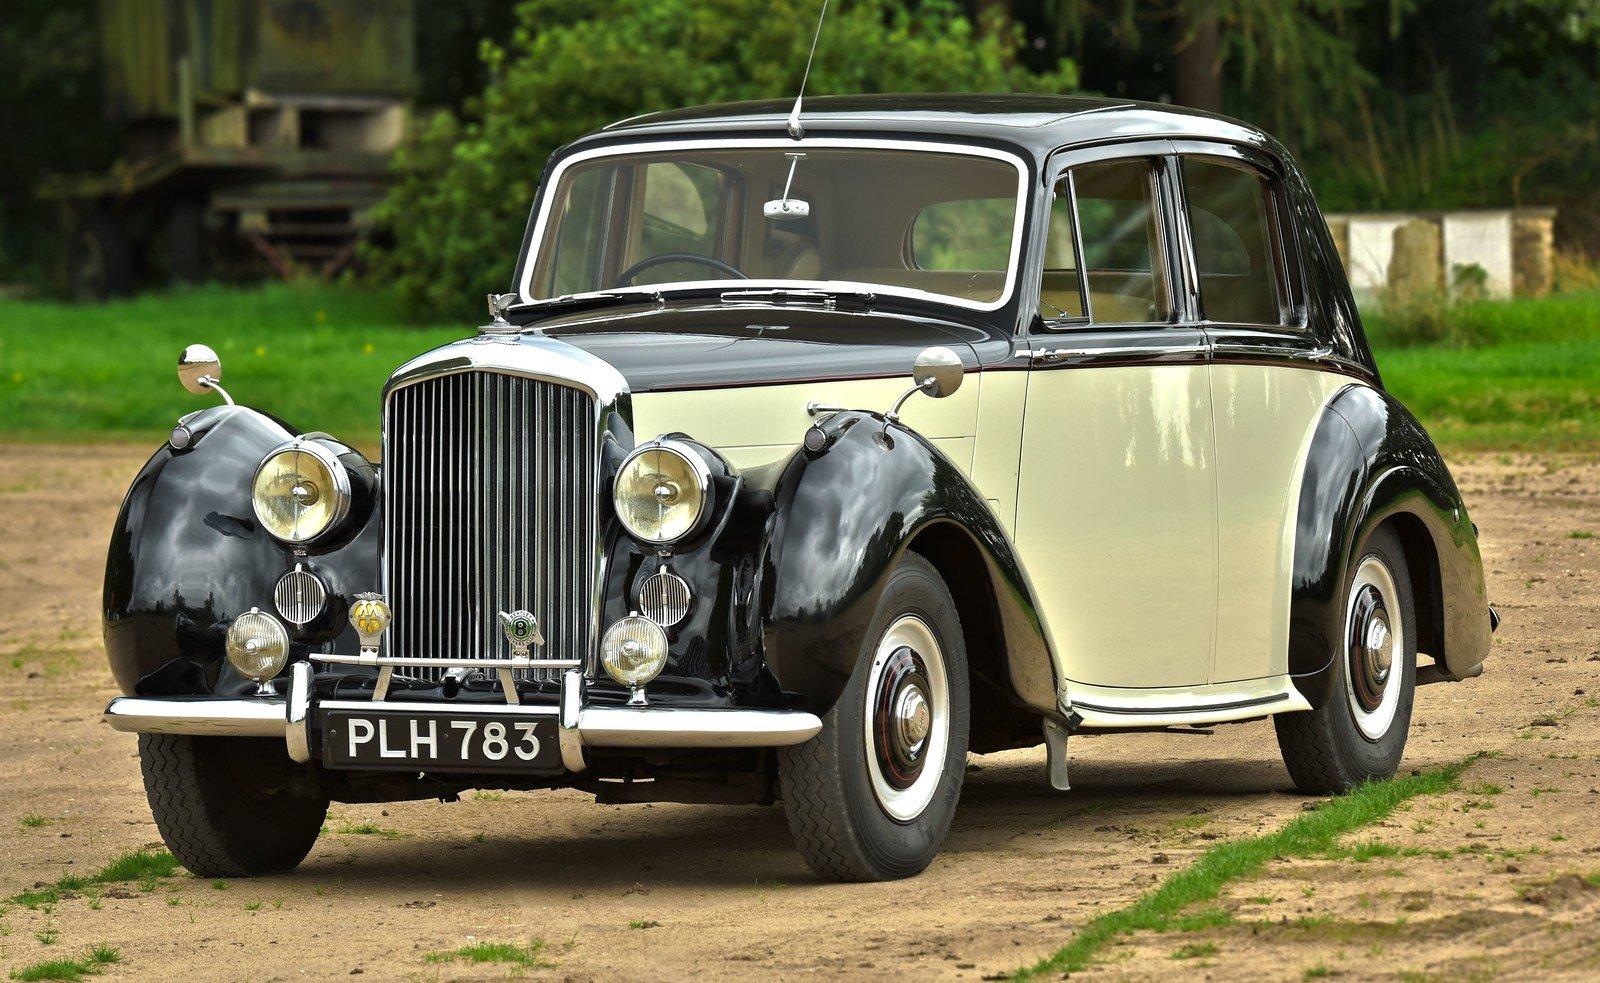 1954 Bentley R Type Standard Steel Saloon For Sale (picture 1 of 6)